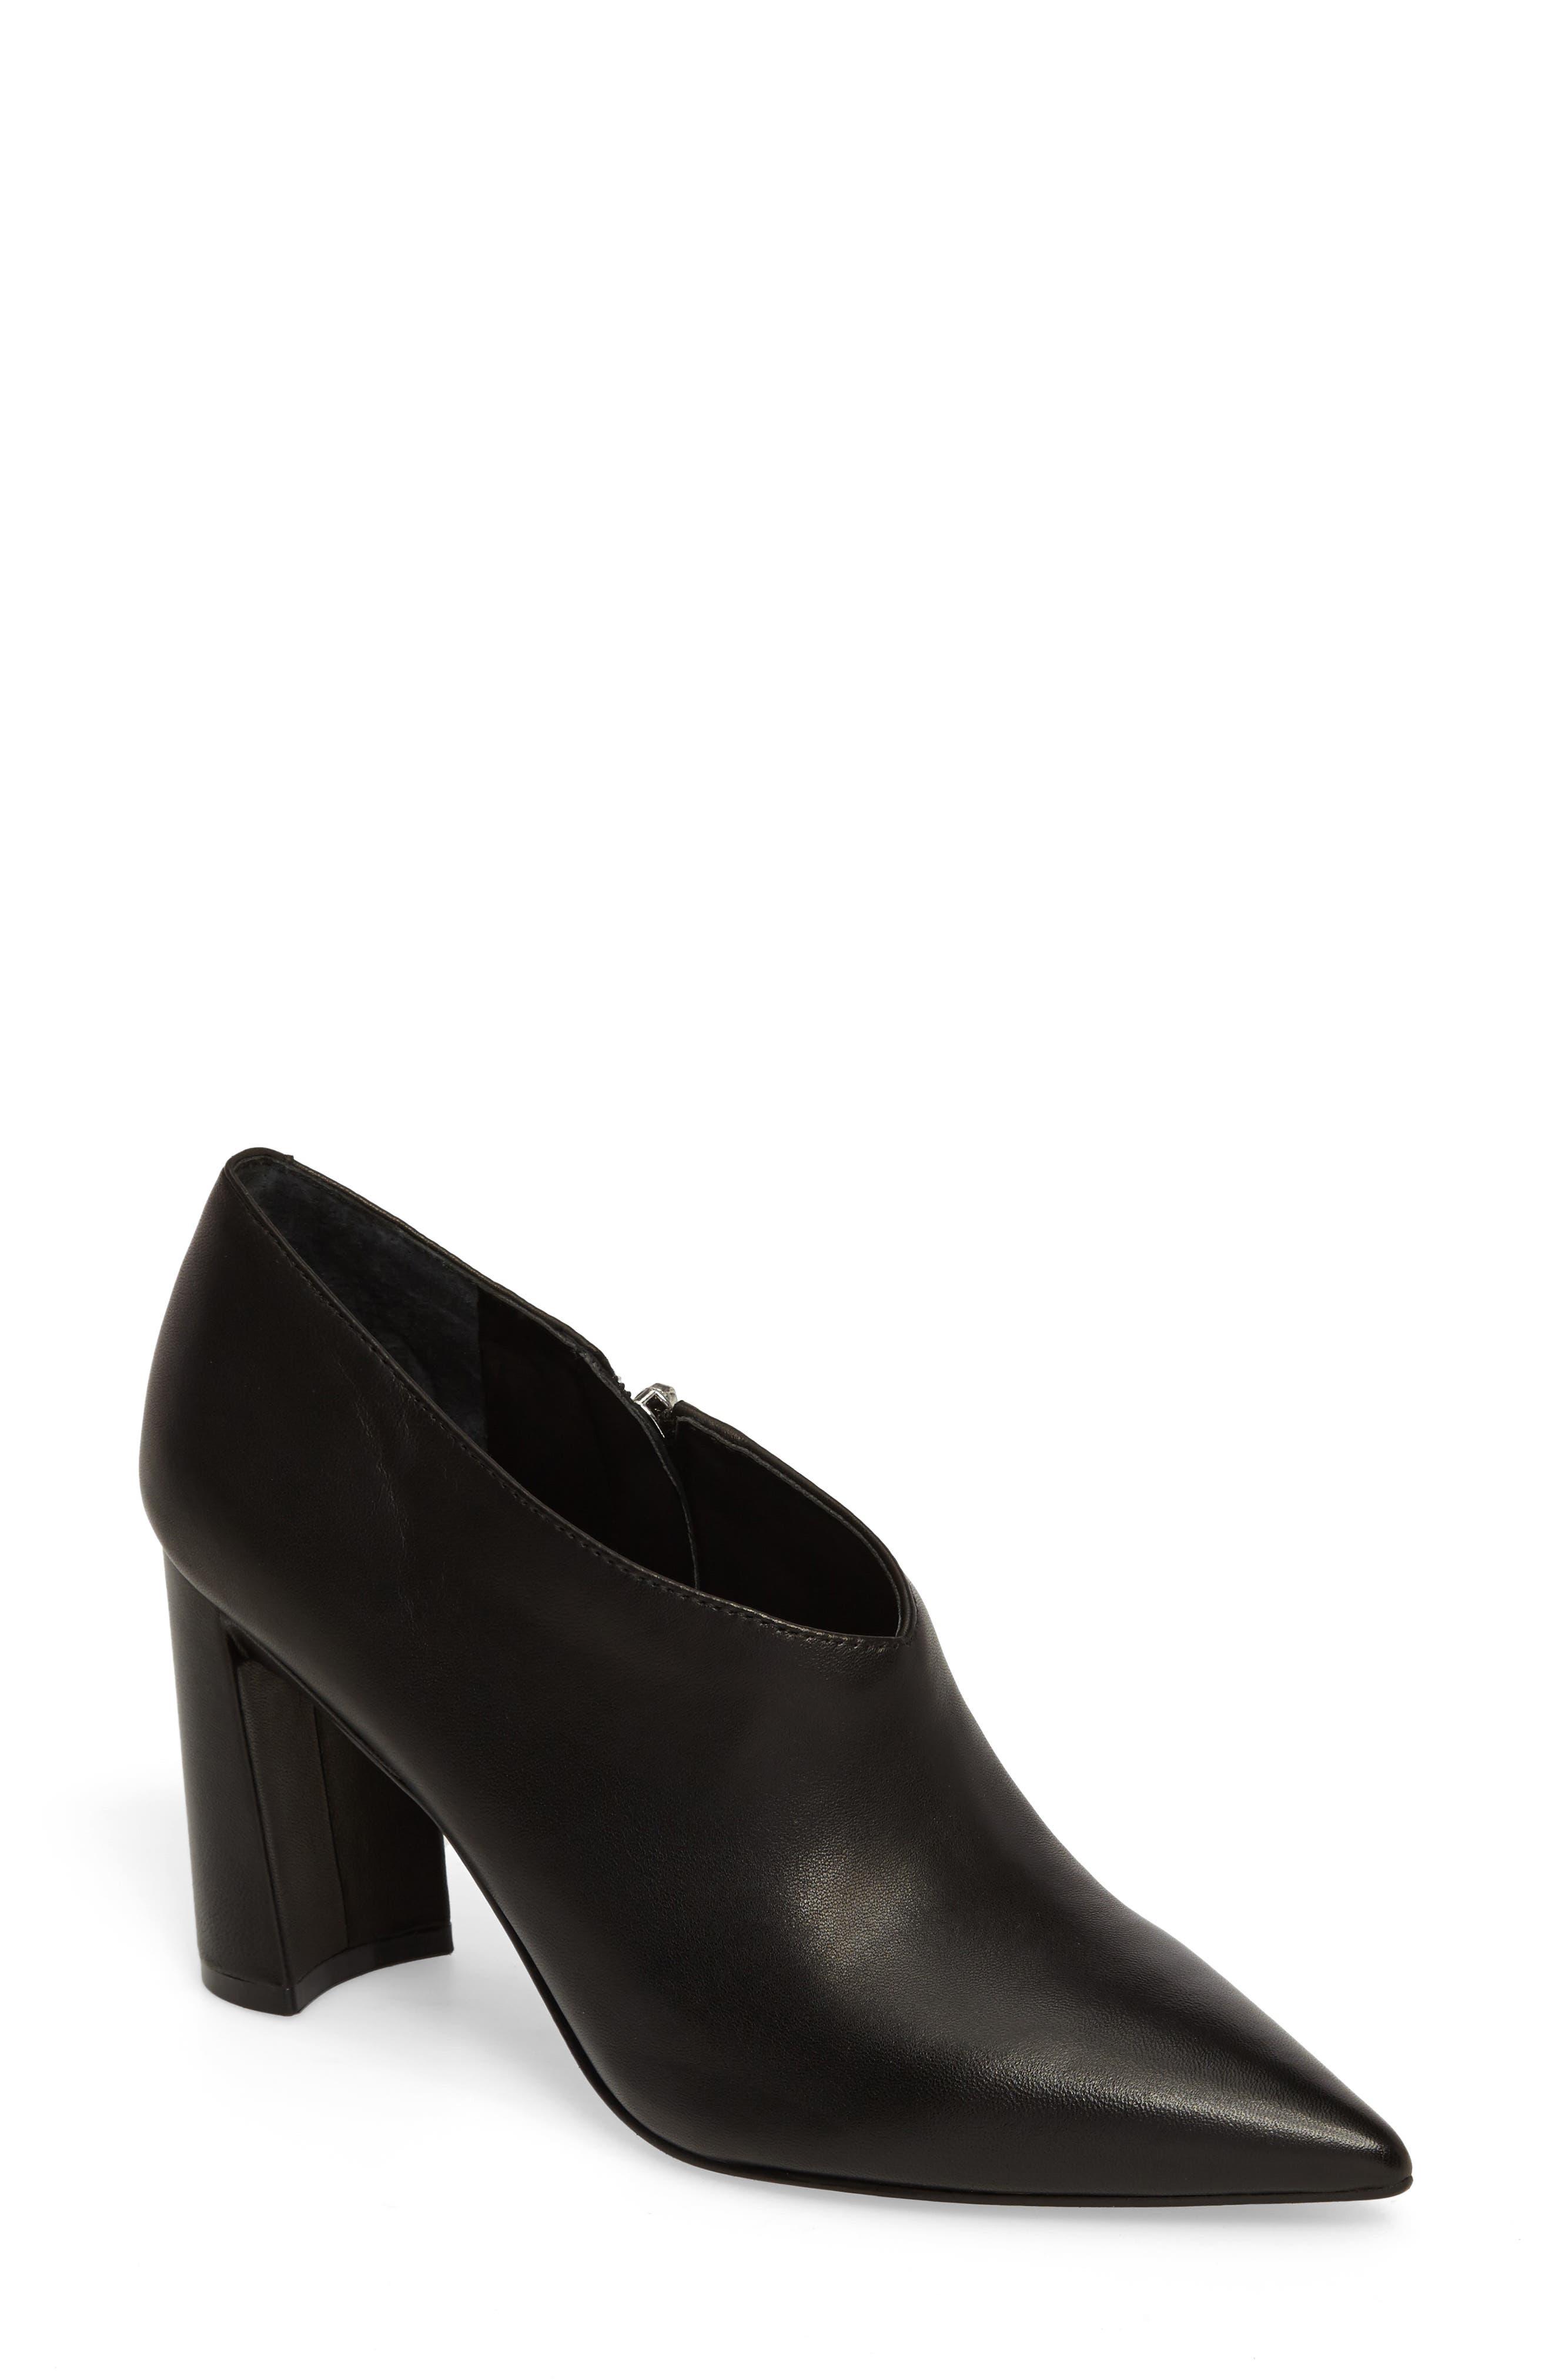 Alternate Image 1 Selected - Marc Fisher LTD Hoda Pointy Toe Bootie (Women)